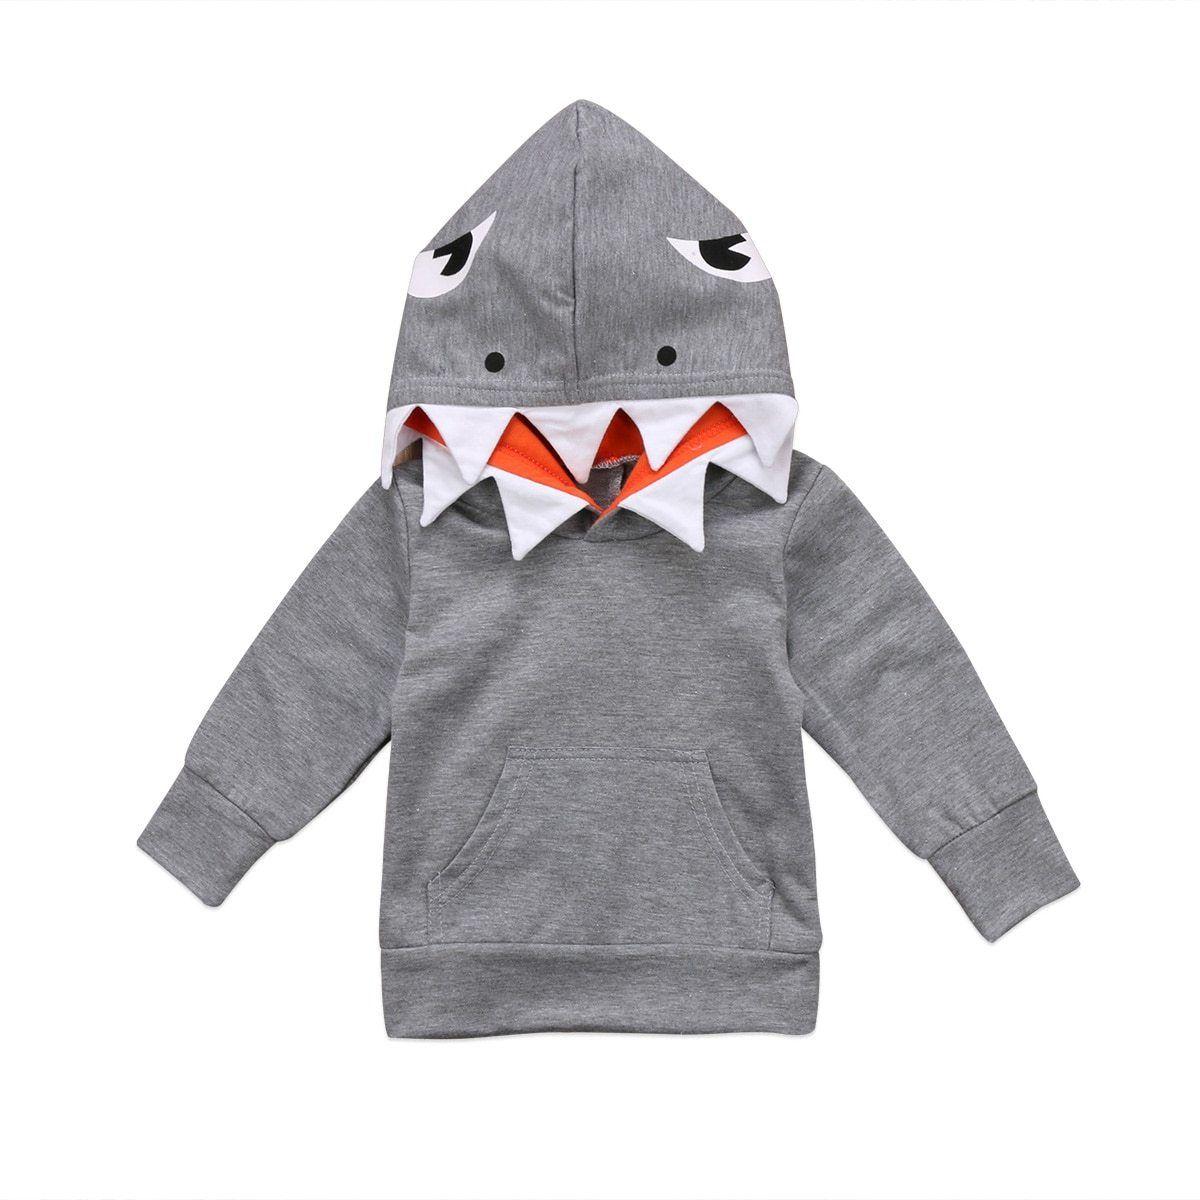 Shark Hoodie Hoodie Babyclothes Babyproducts Babyshark Parenting Baby Sweatshirt Shark Hoodie Boys Hoodies [ 1200 x 1200 Pixel ]